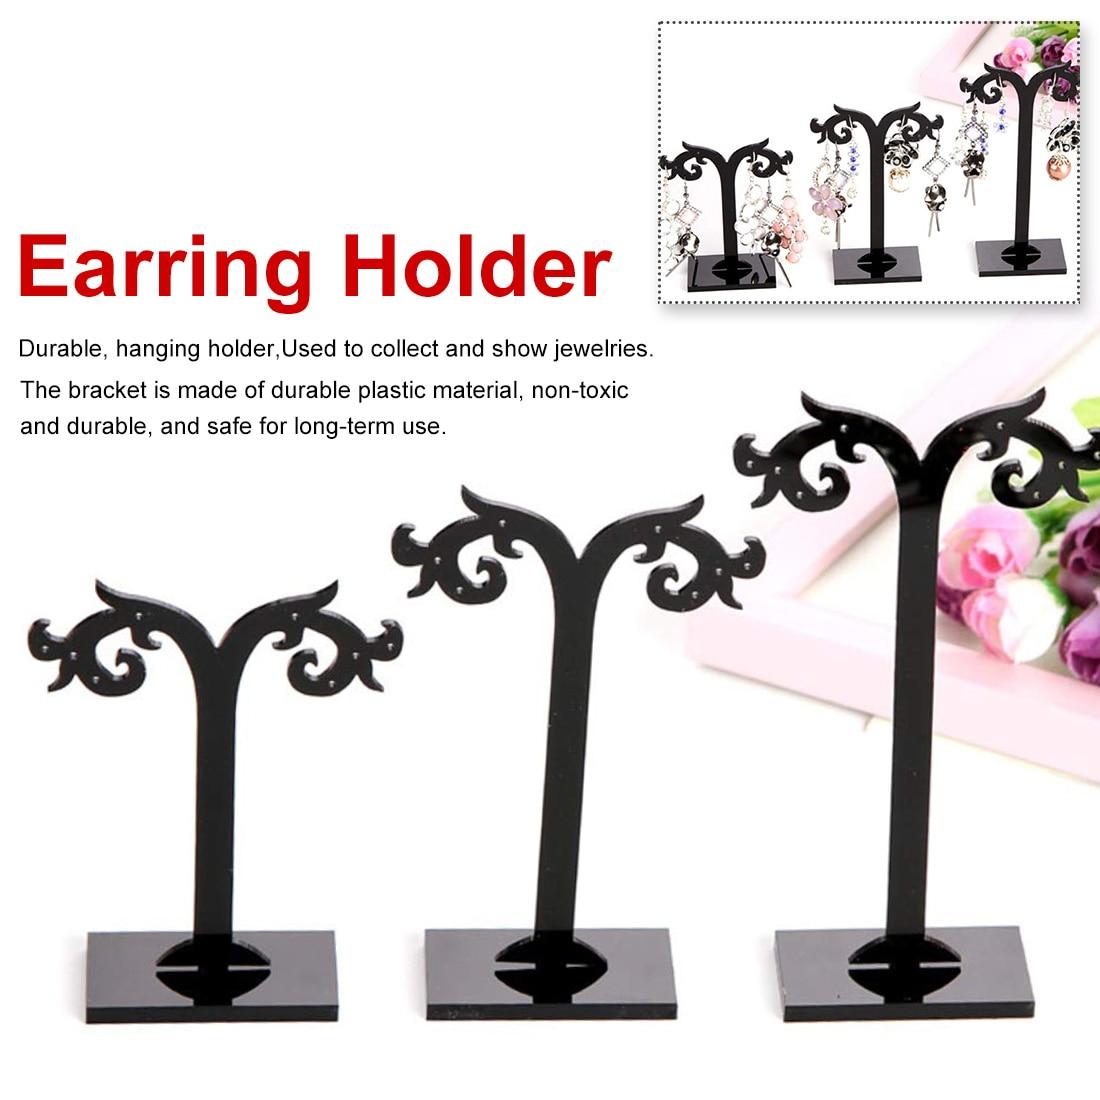 3Pcs Acrylic Earring Display Stand Showcase Jewelry Organizer Holder Jewelry Frame Black Anti-Deformation Earring Stand Storage